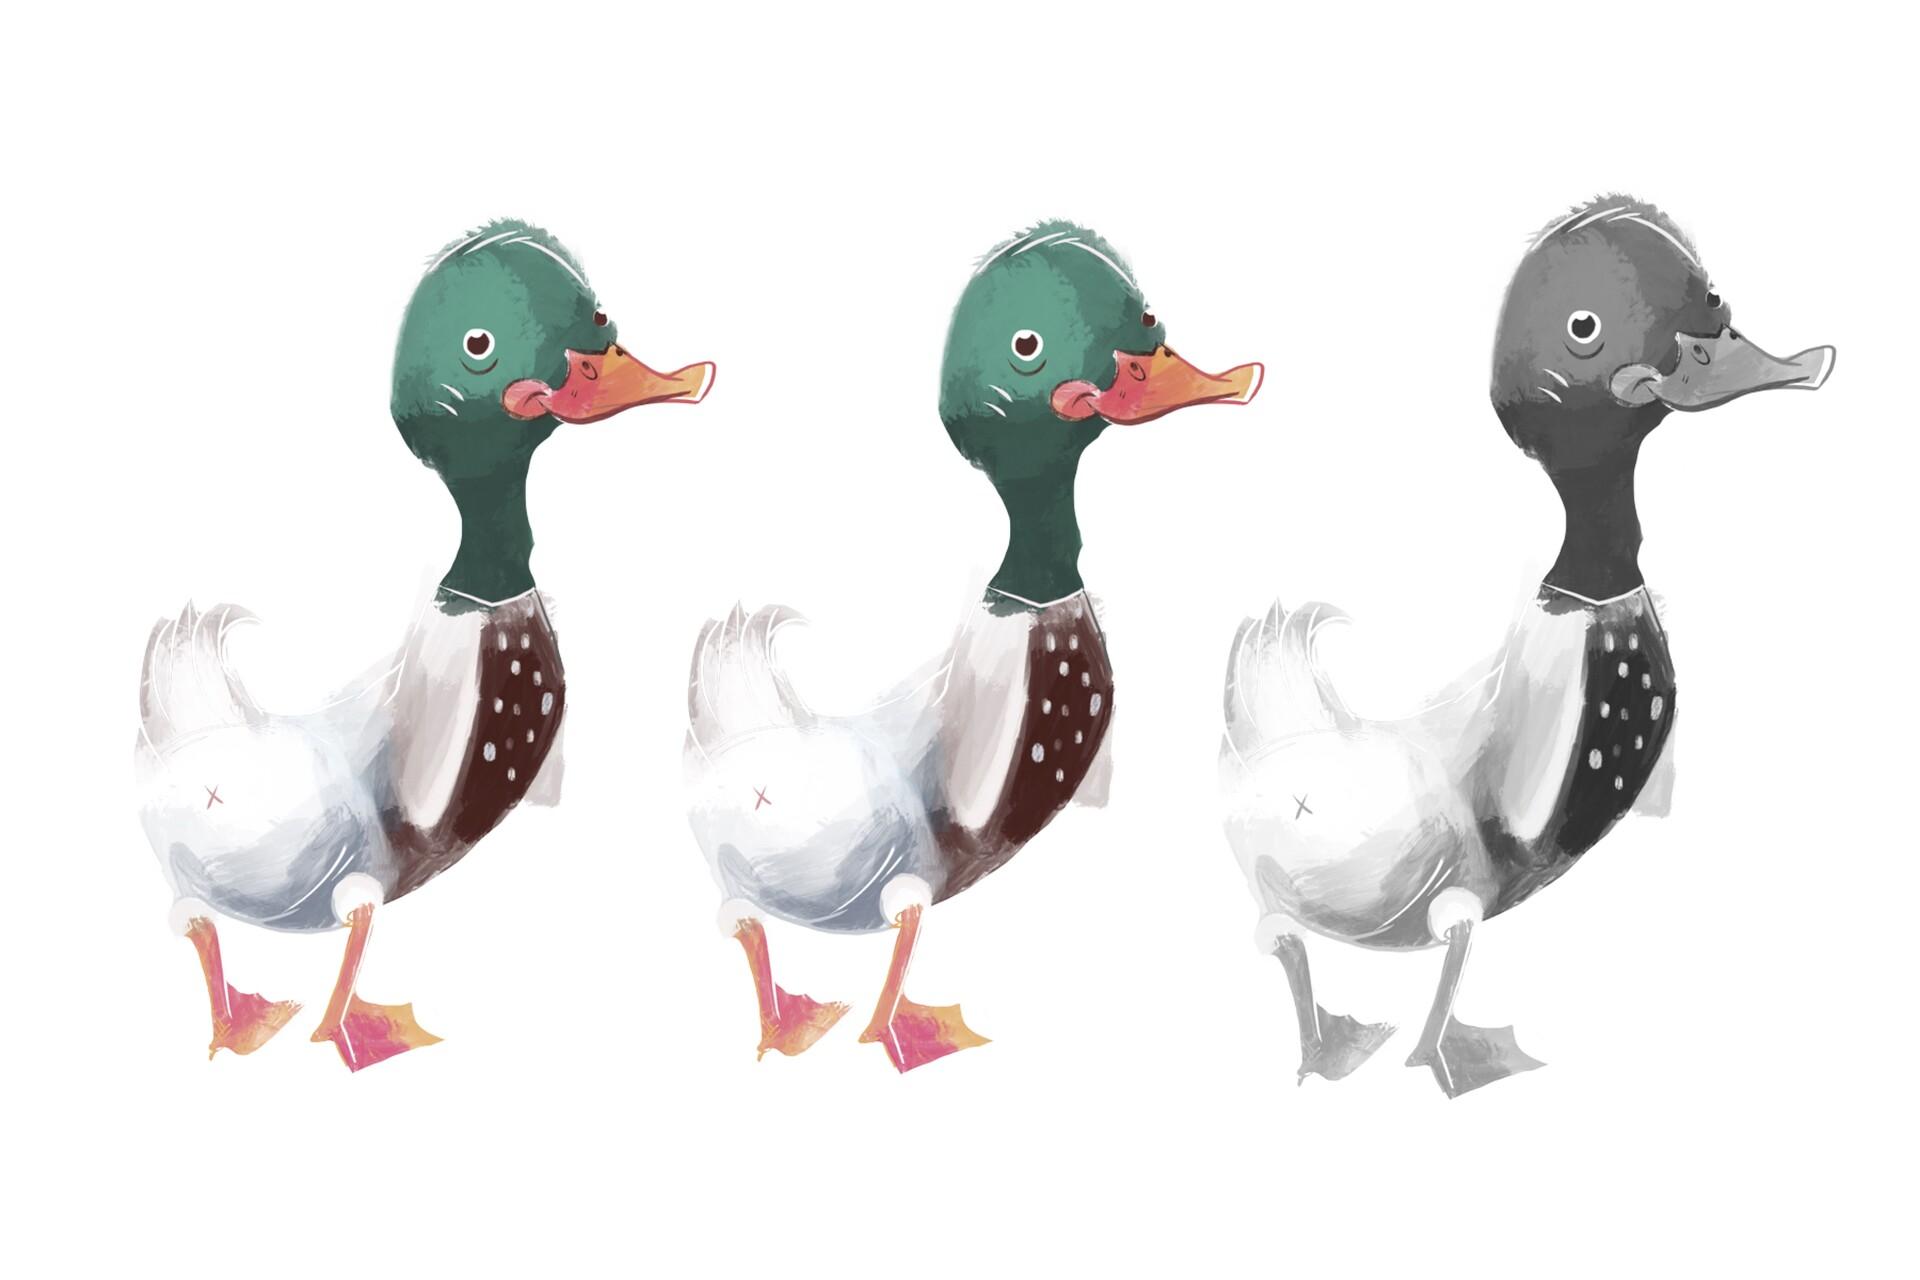 Mccal joy duckduckgrayduck design mccal